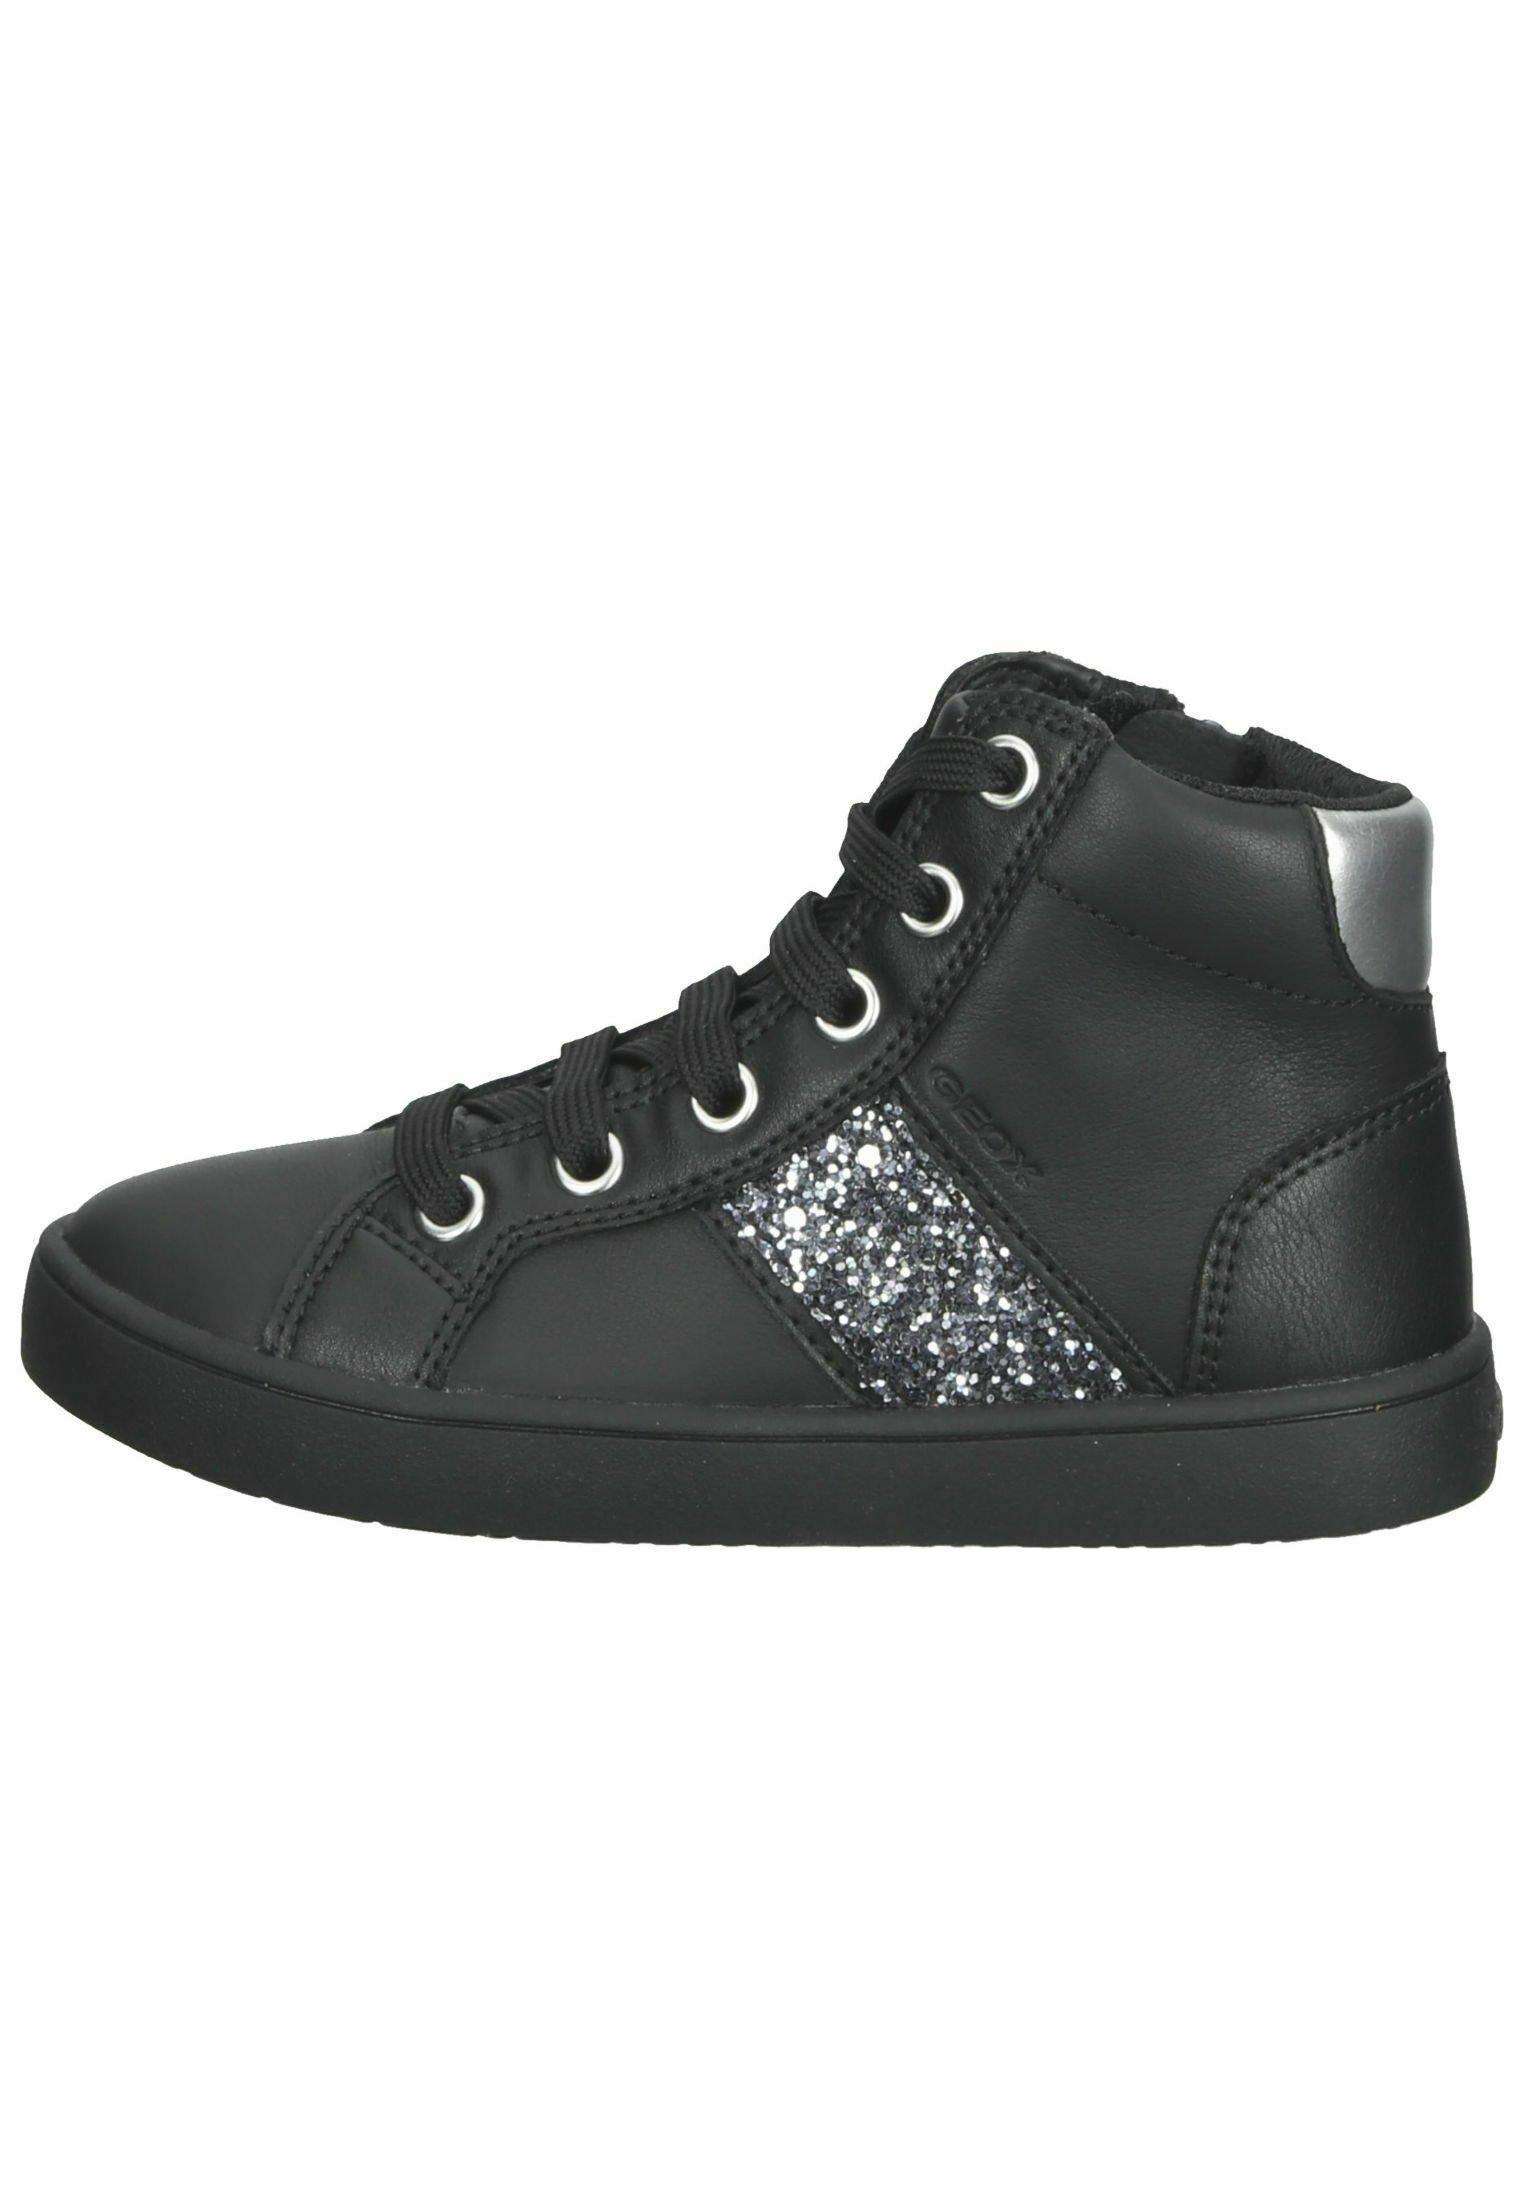 Kinder Sneaker high - schwarz